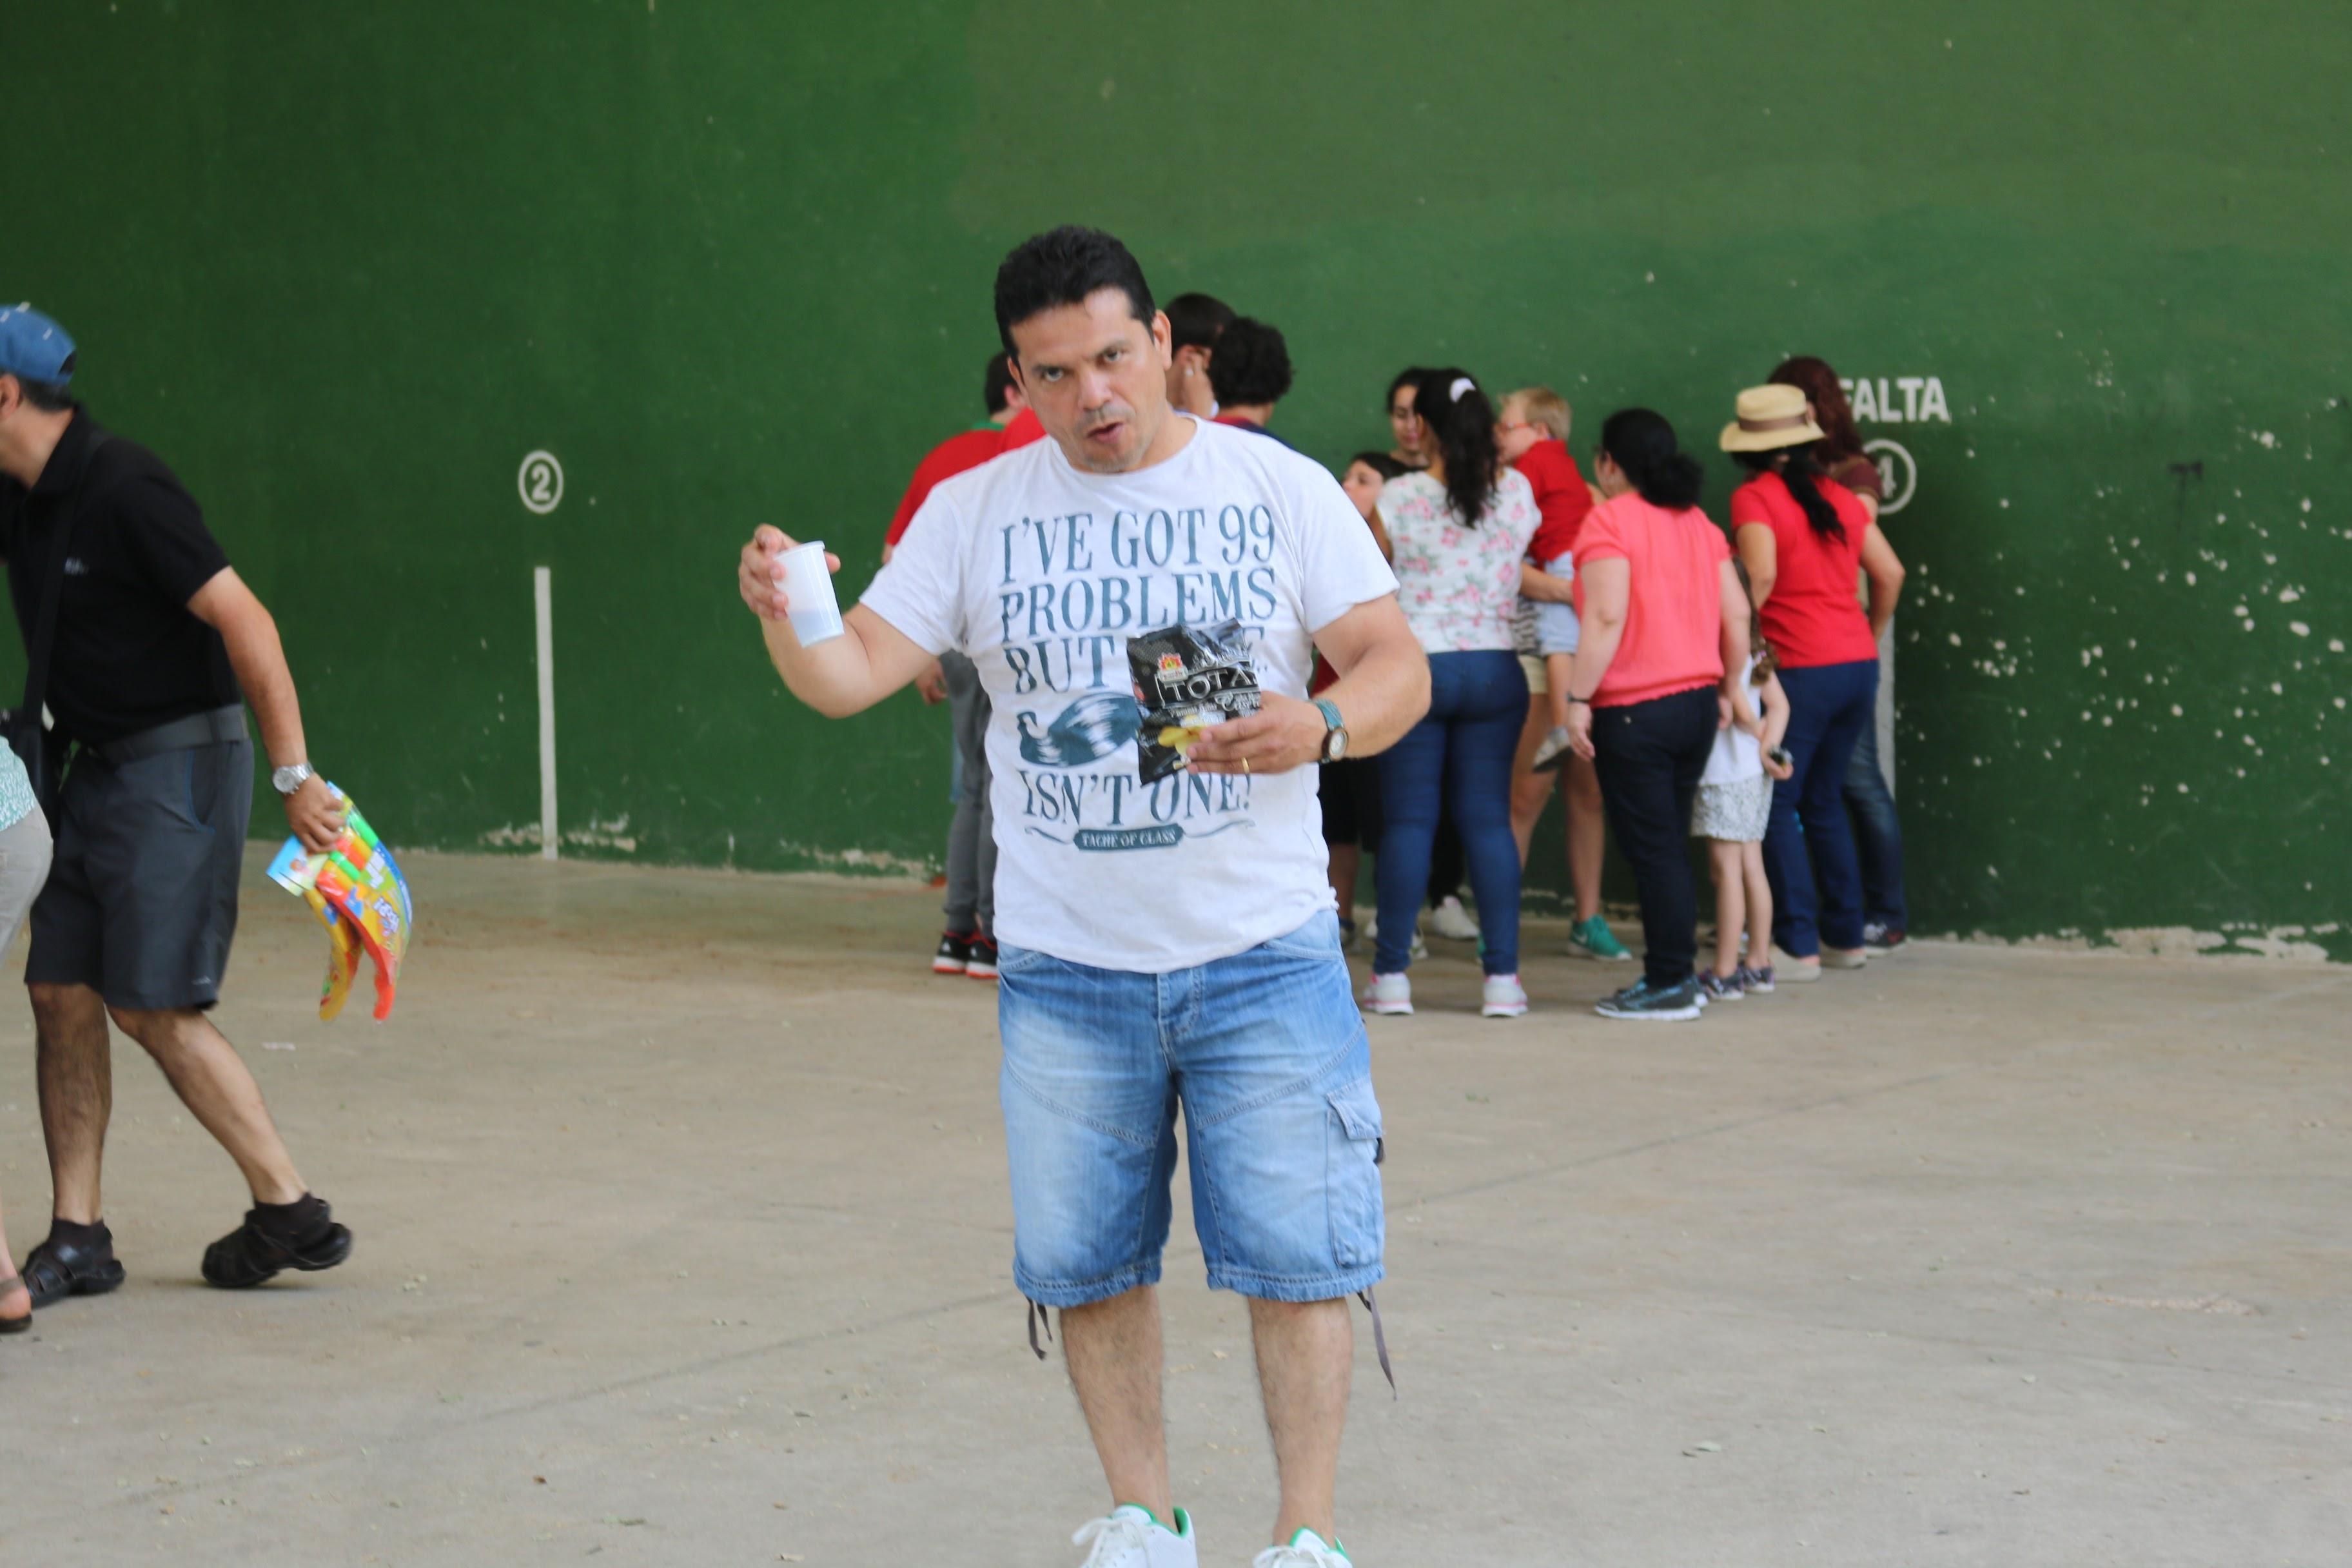 Picasa - Día de Campo SdJ 05.07.2015 (29).jpg